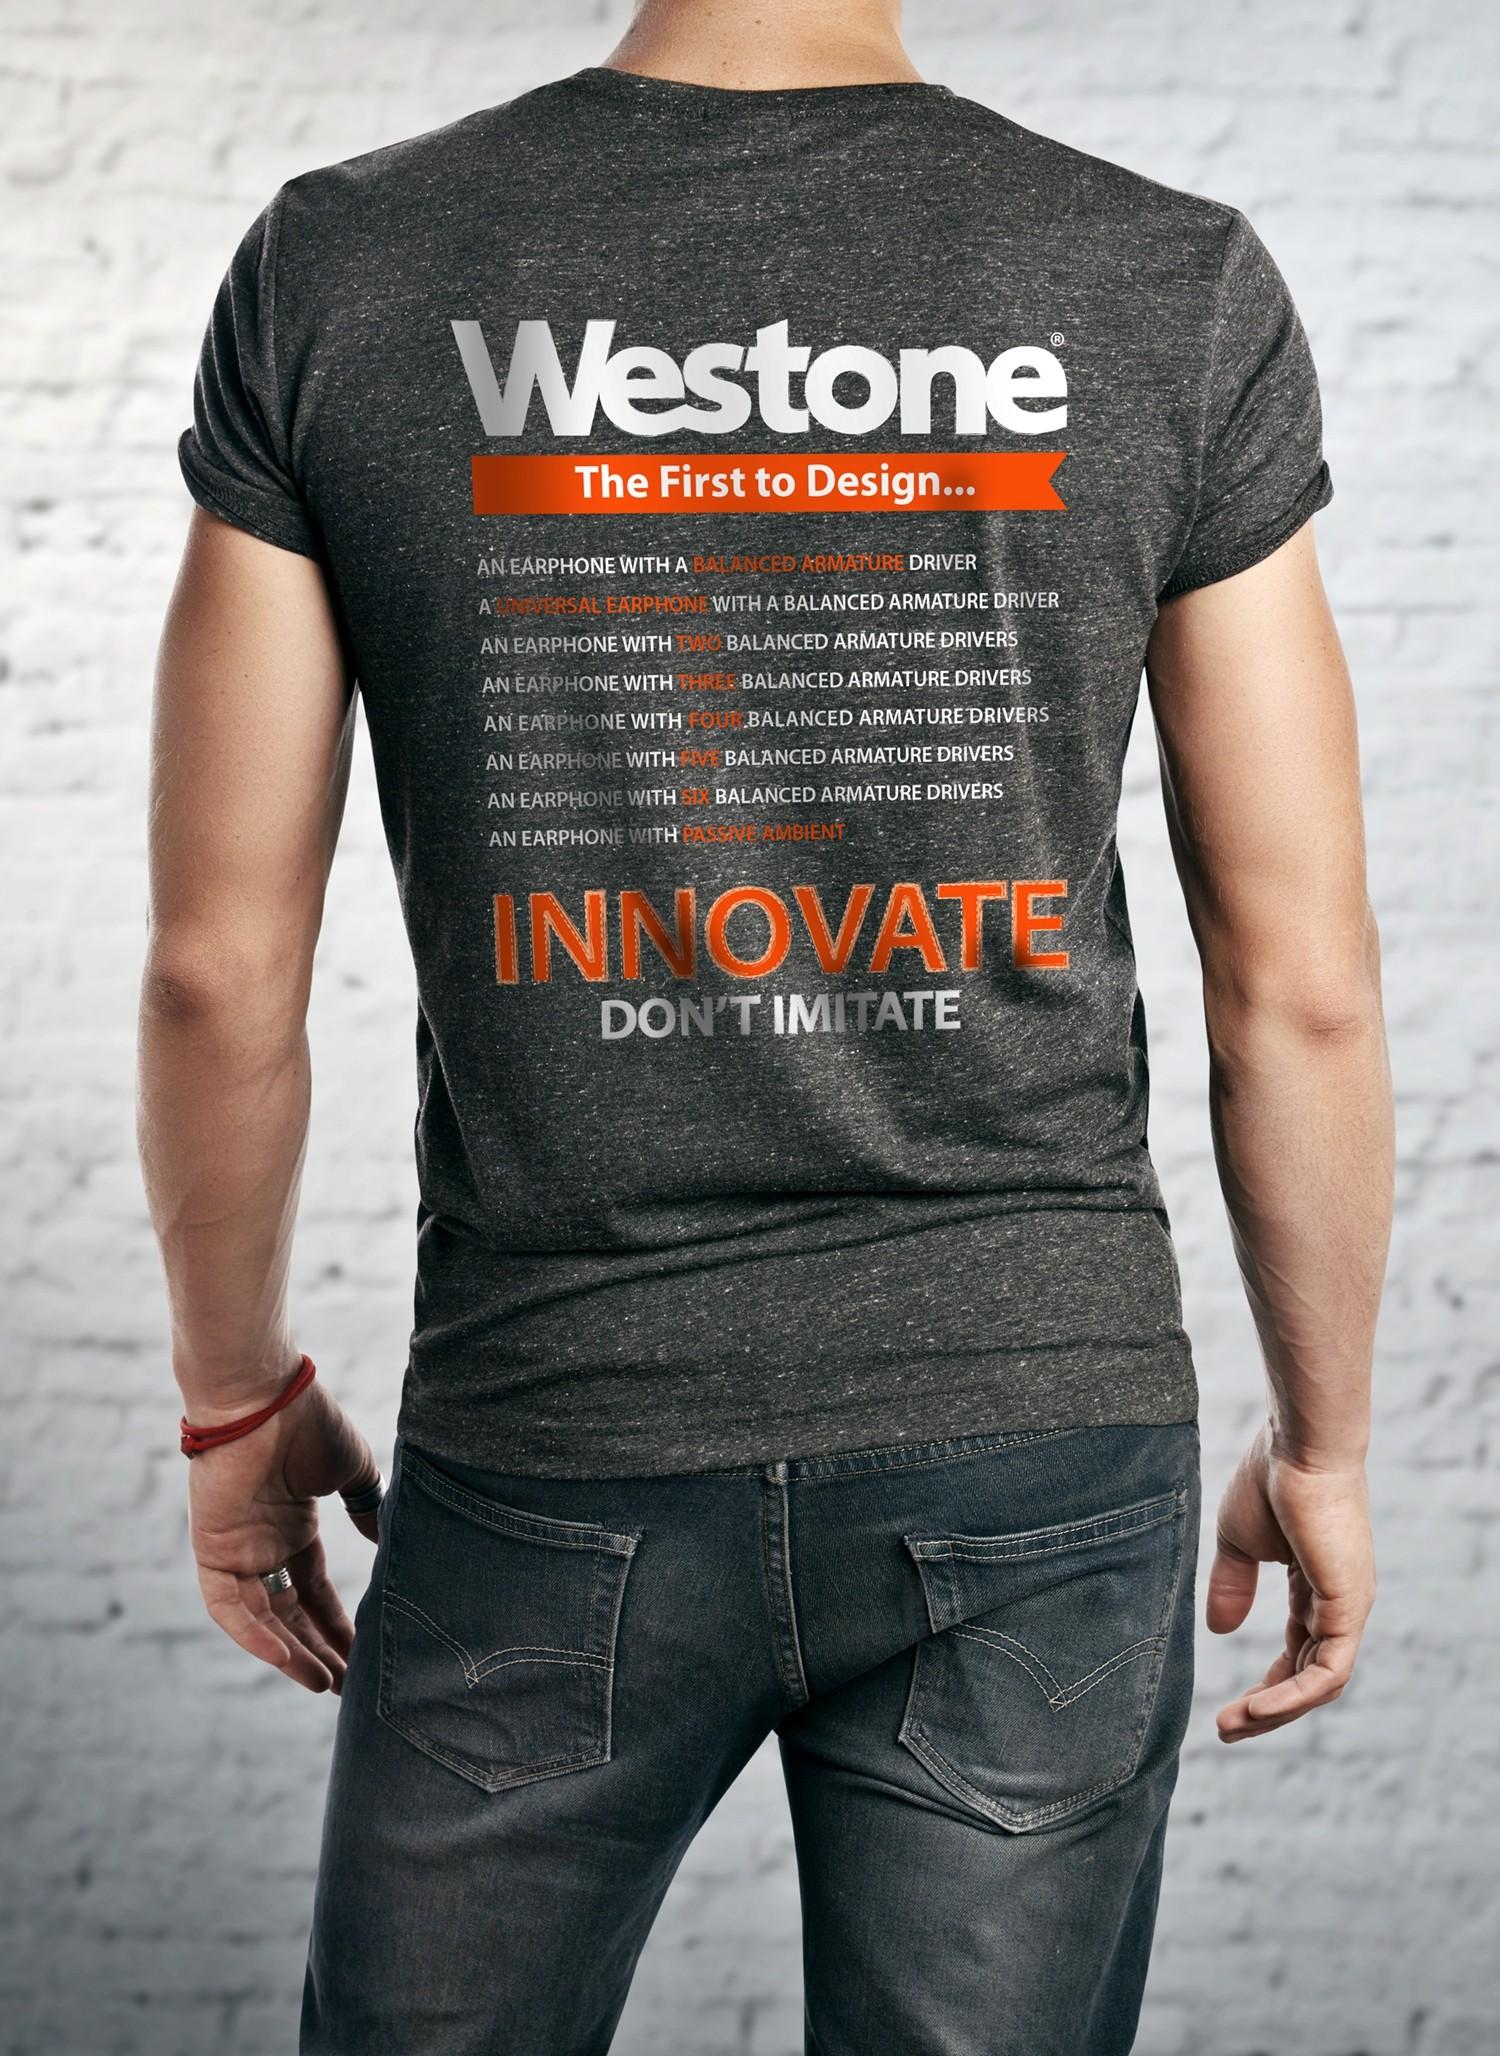 Westone Since 1959 T-Shirt Back